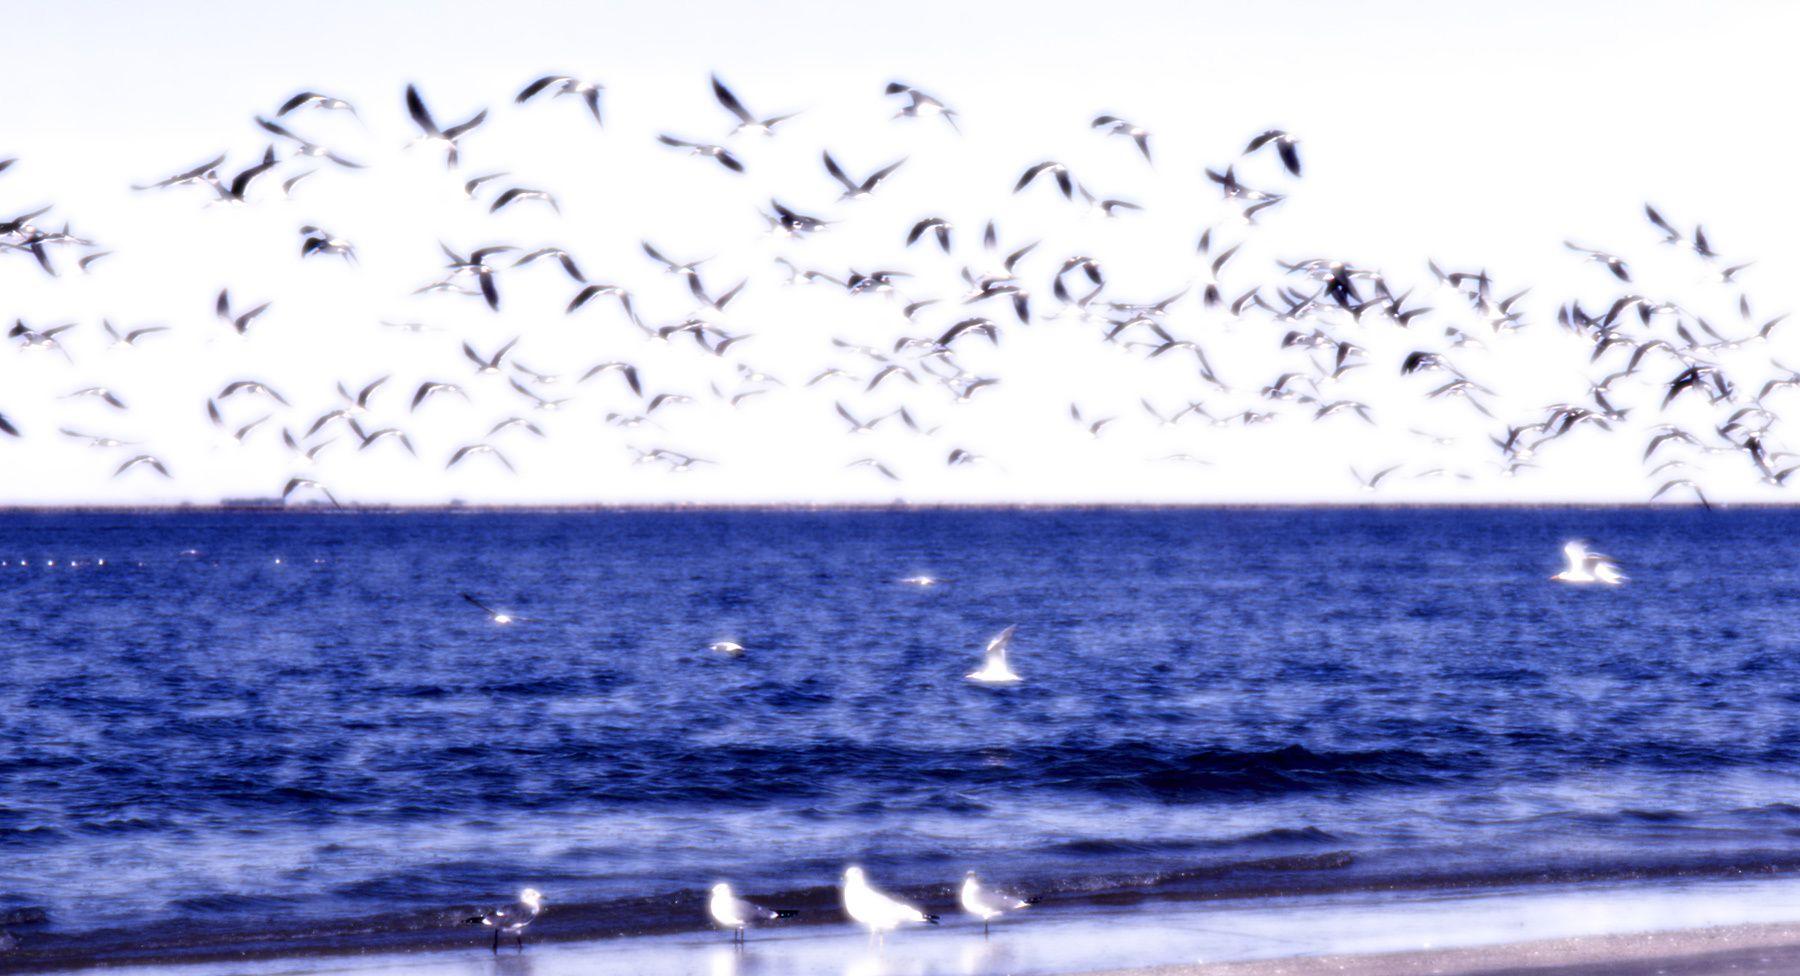 1seagulls.jpg